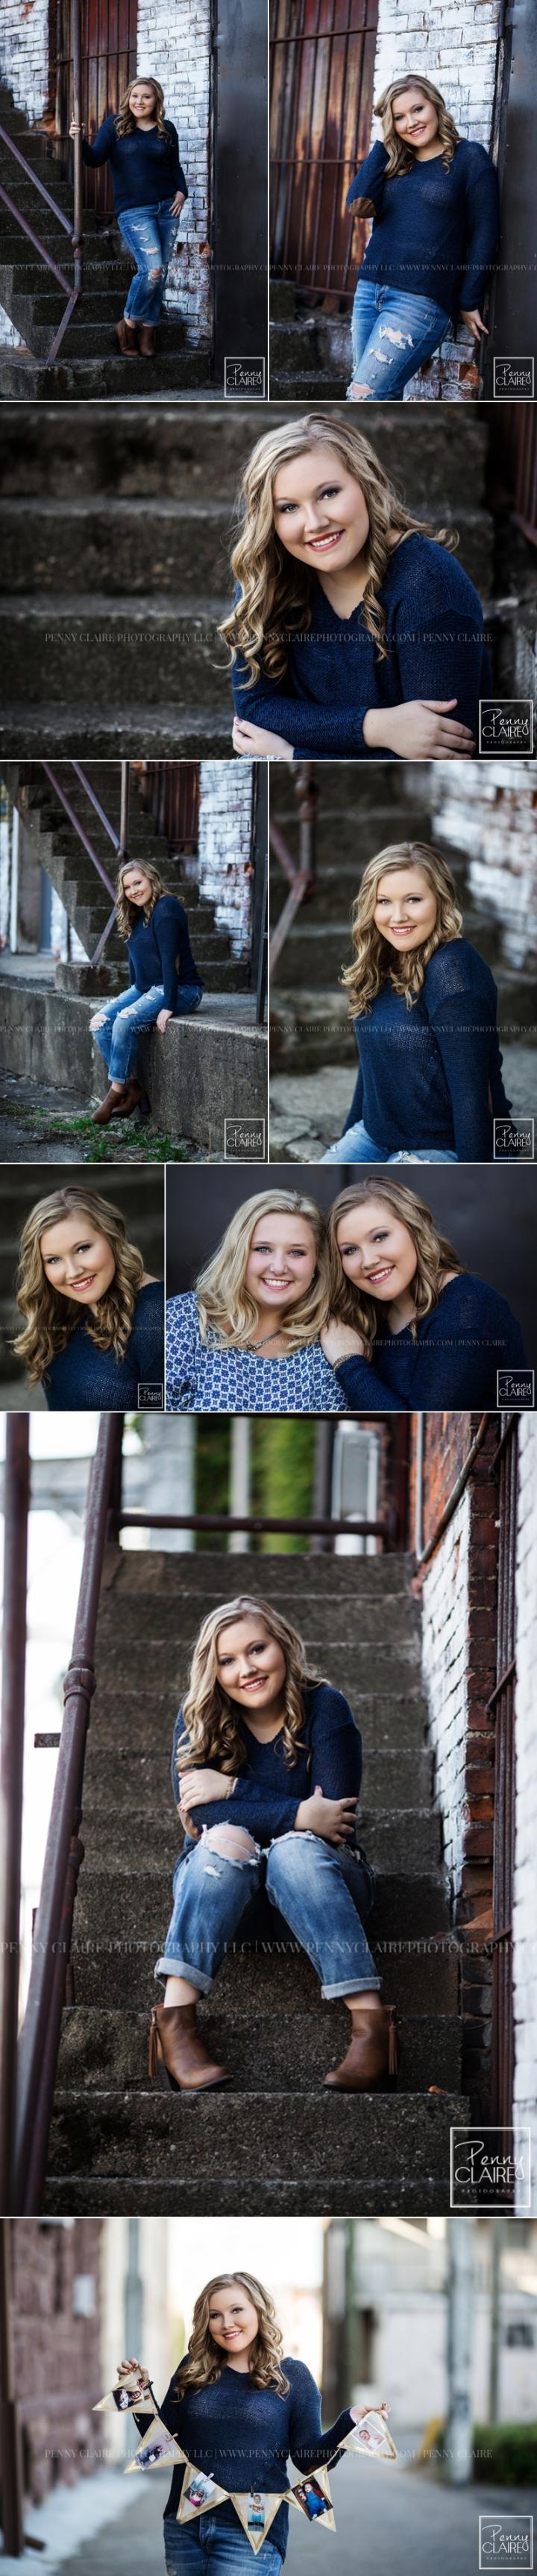 high-school-senior-photos-pennyclaire-7